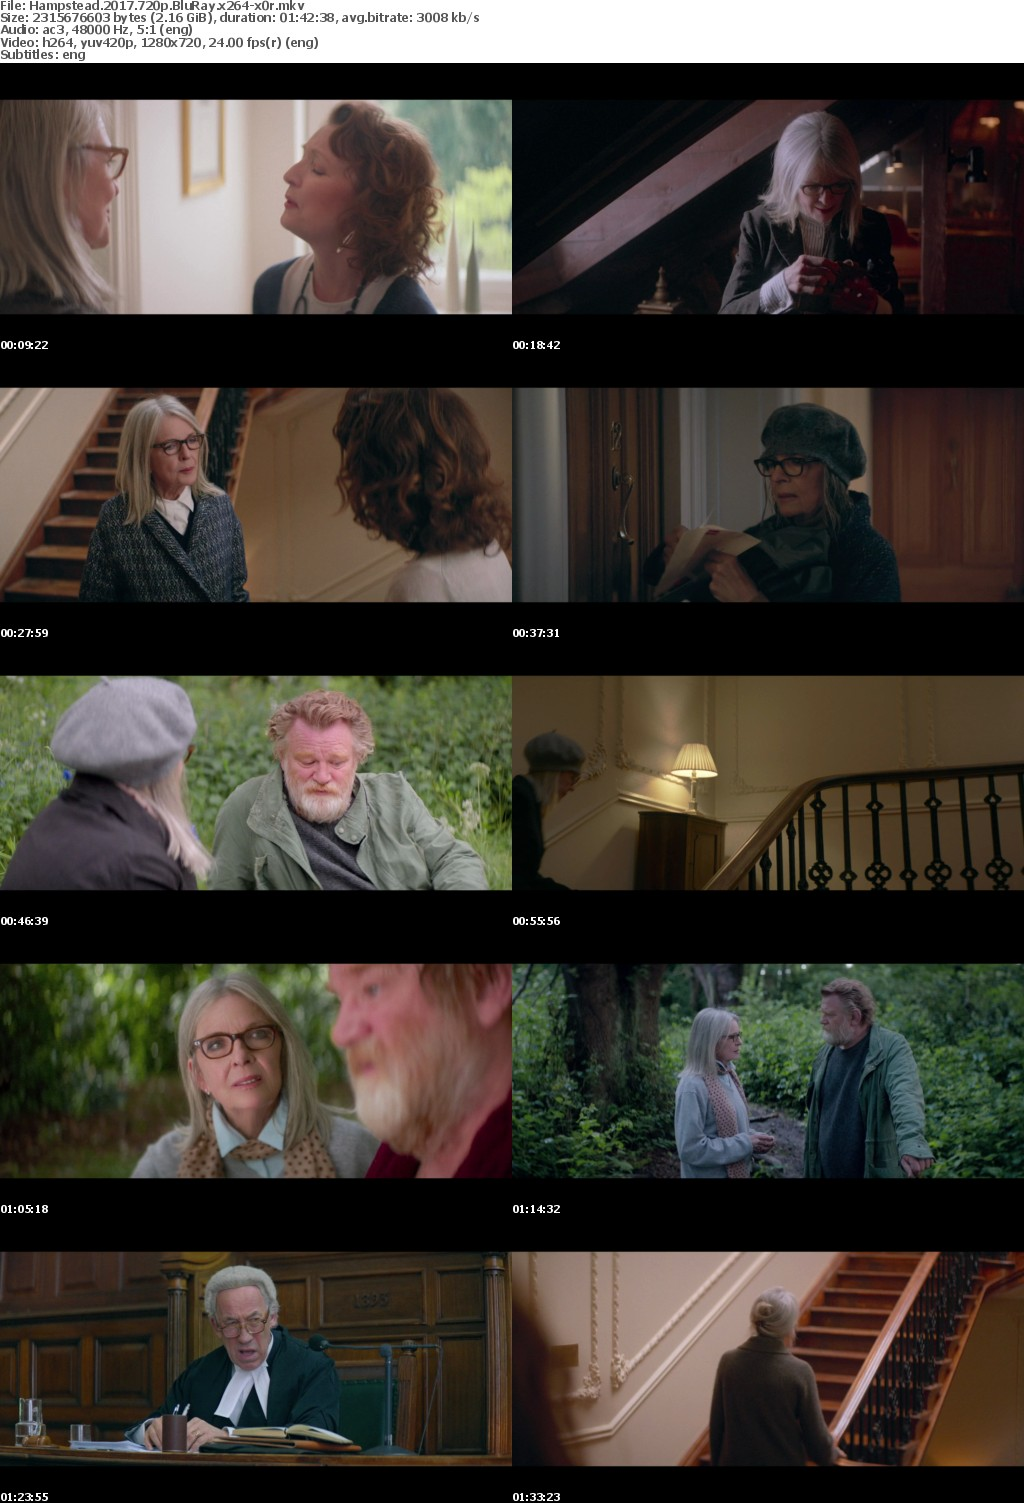 Hampstead 2017 720p BluRay x264-x0r